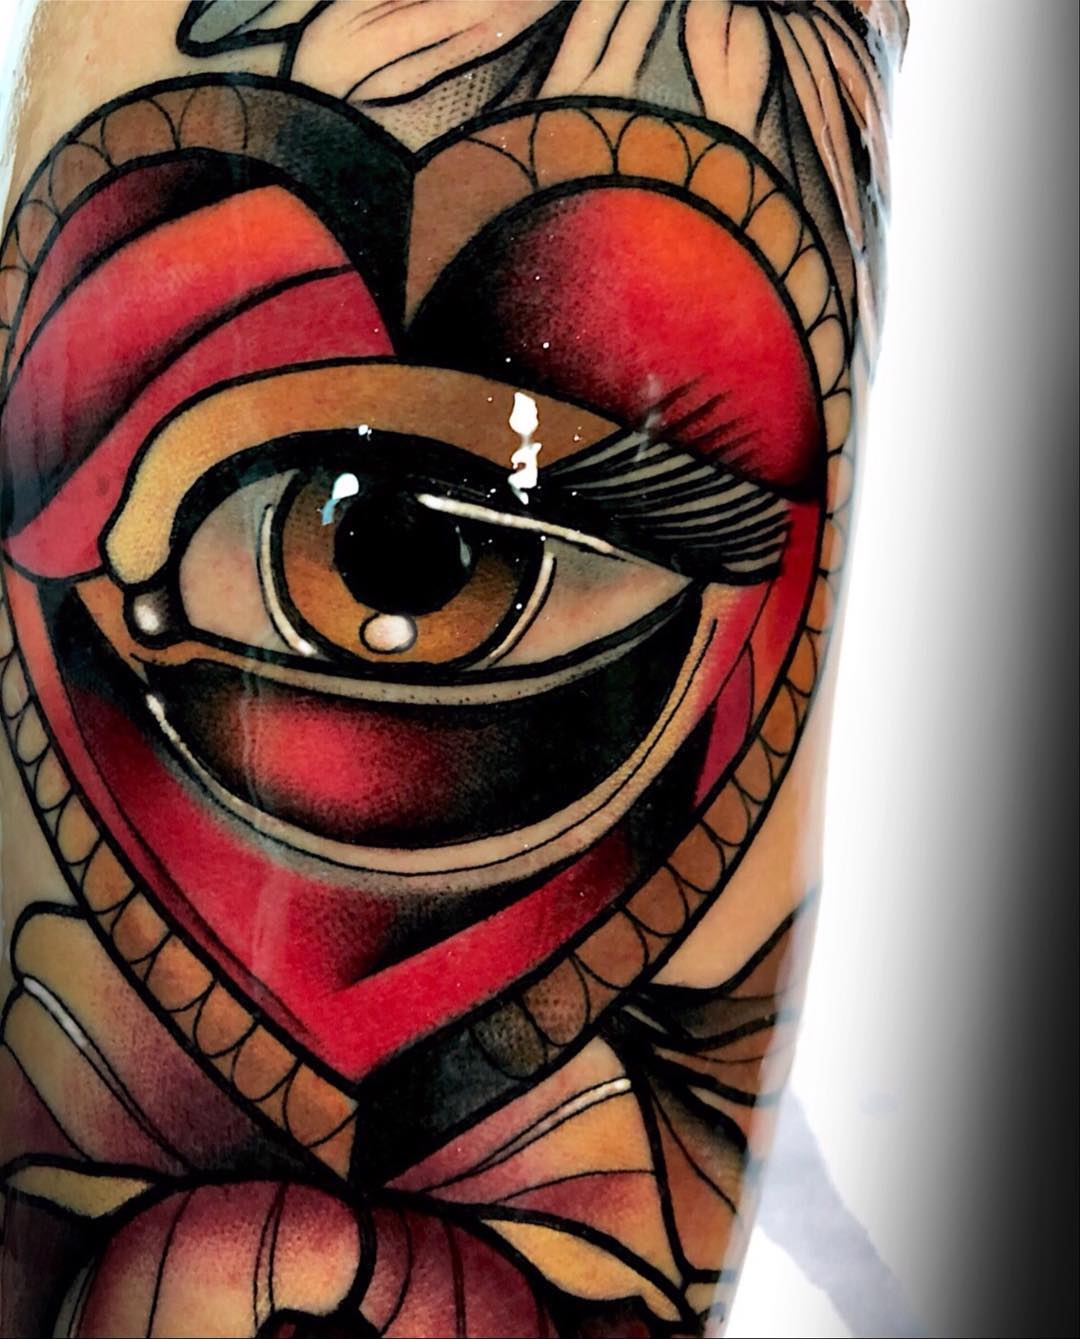 followforfollow,followmeciudadreal,ciudadreal,tomelloso,almagro,puertollano,tatuajesenpuertollano,tatuajesendaimiel,ciudadrealtattoo,ciudadrealtatuajes,tatuajesciudadreal,follow,ciudadrealtatuajes,puertollano,ciudadreal,tattoos,ciudadrealtattoo,tattooers,besttattooers,juantabasco,ciudadrealsetatua,ink,tatuajes,realismo,realistictattoo,ciudadrealtattoo,tatuajesenpuertollano,traditionaltattoos,castillalamancha,inked,inkedlife,inkedsociety,art,amazingink,tattooart,thebestspaintattooartists